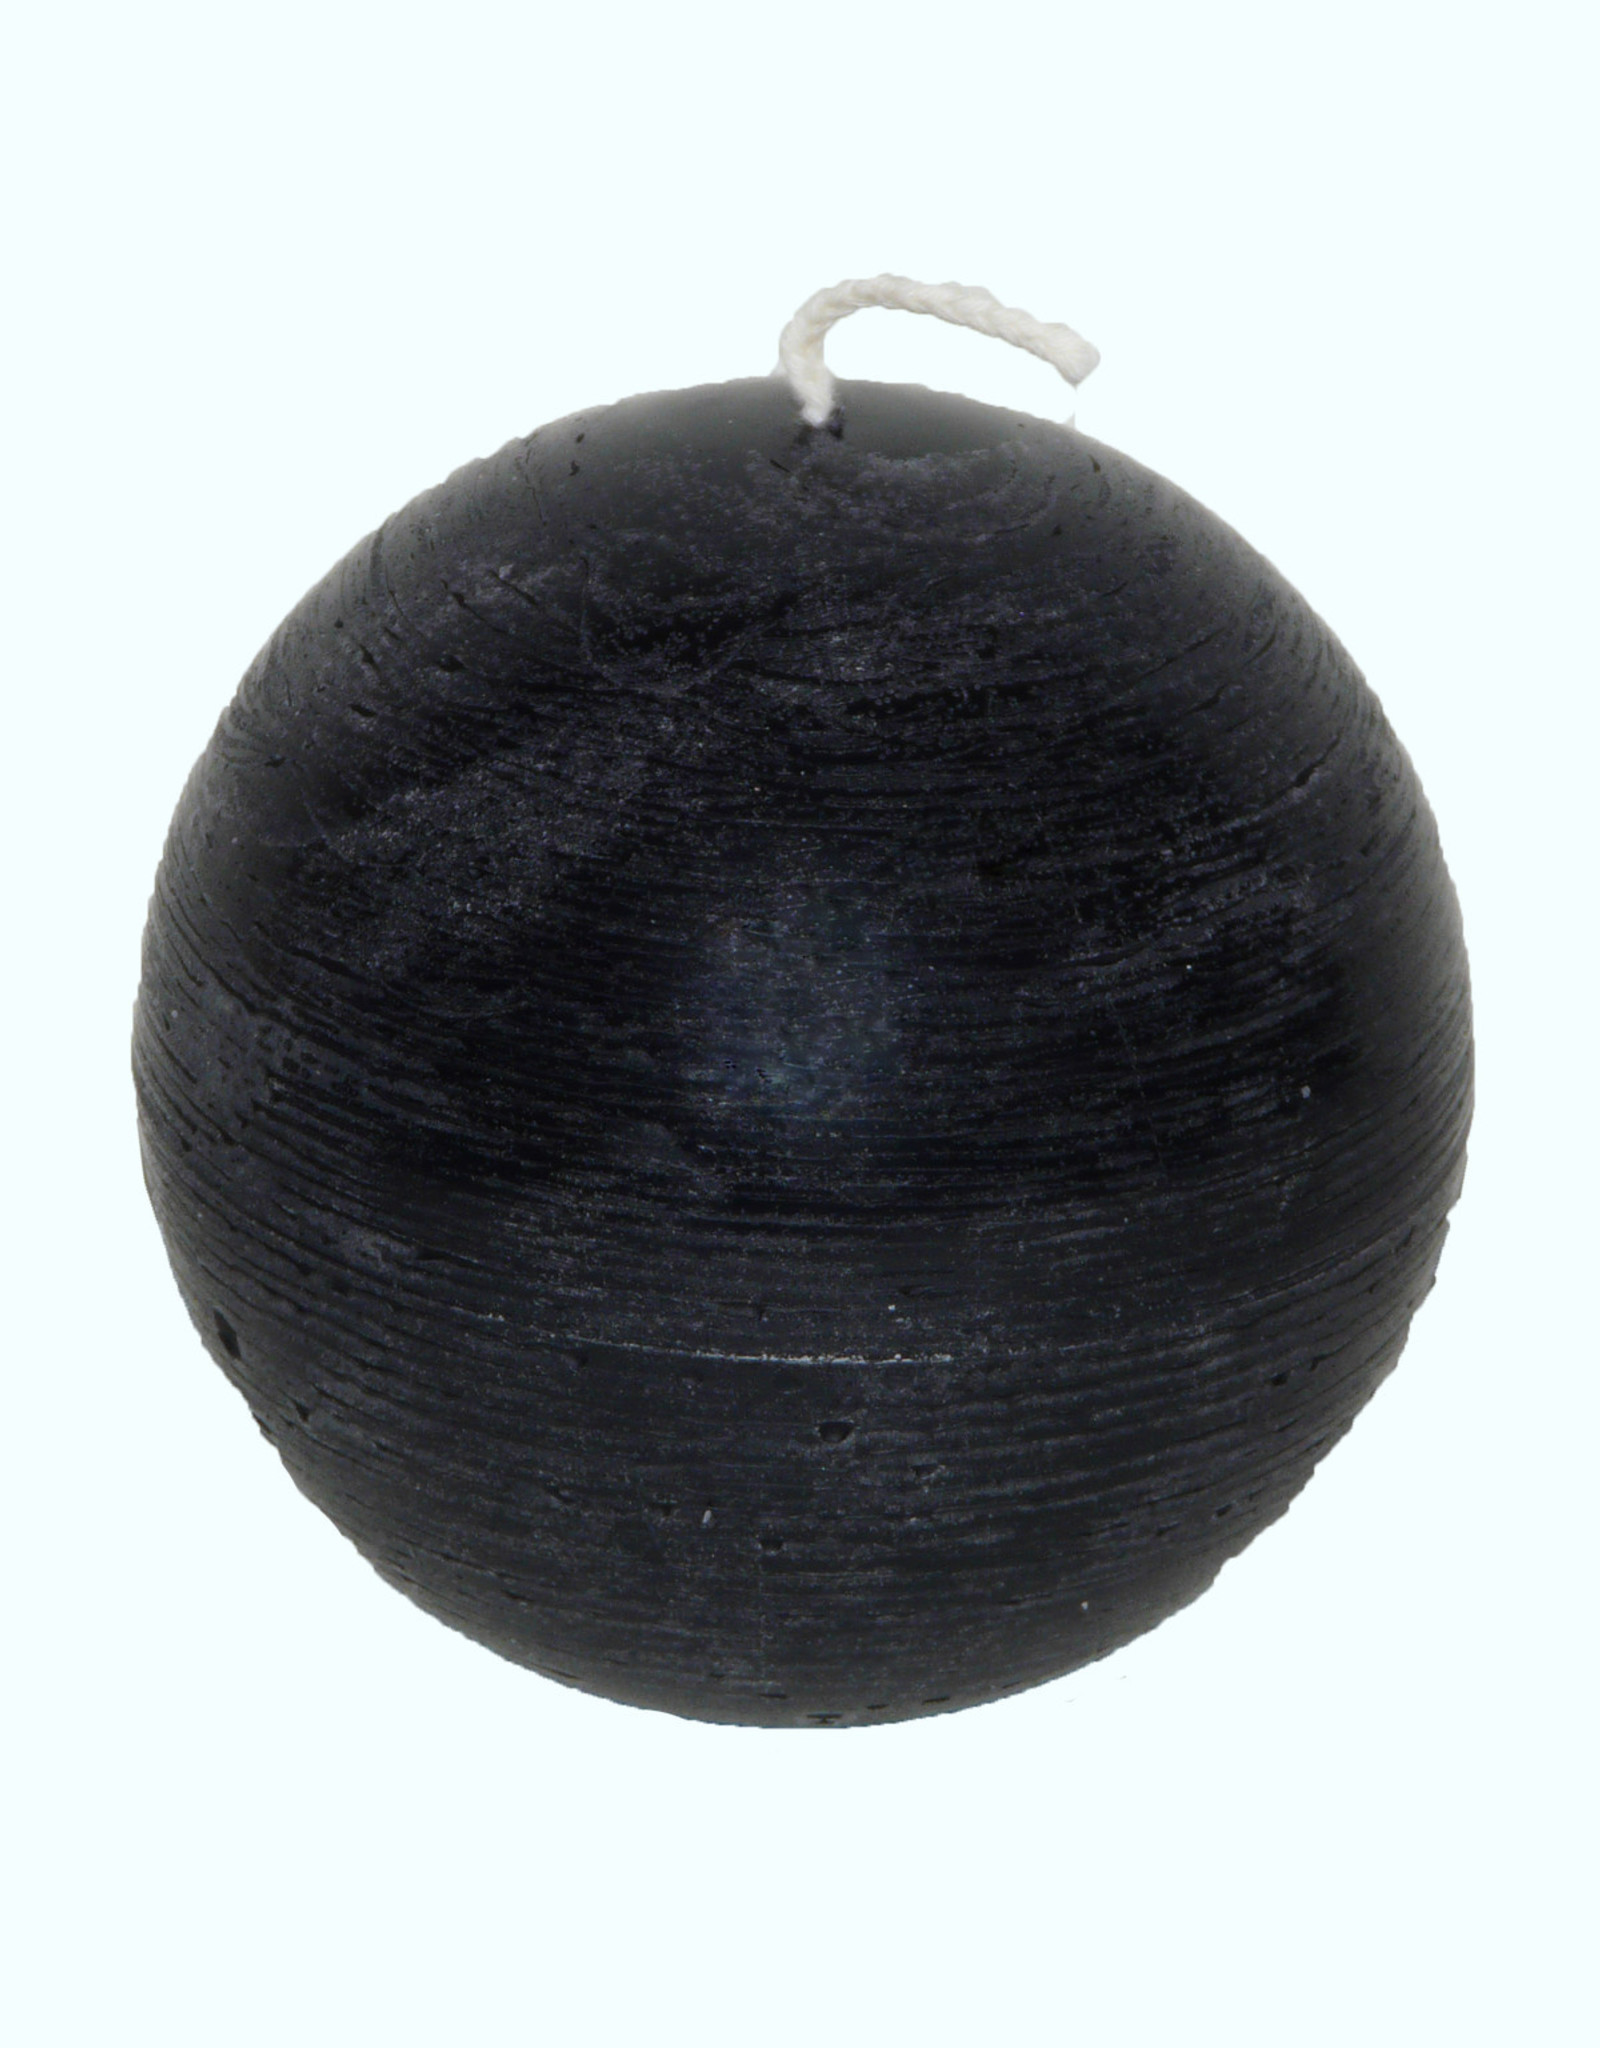 Bolkaars Rustique Zwart Ø 10 cm